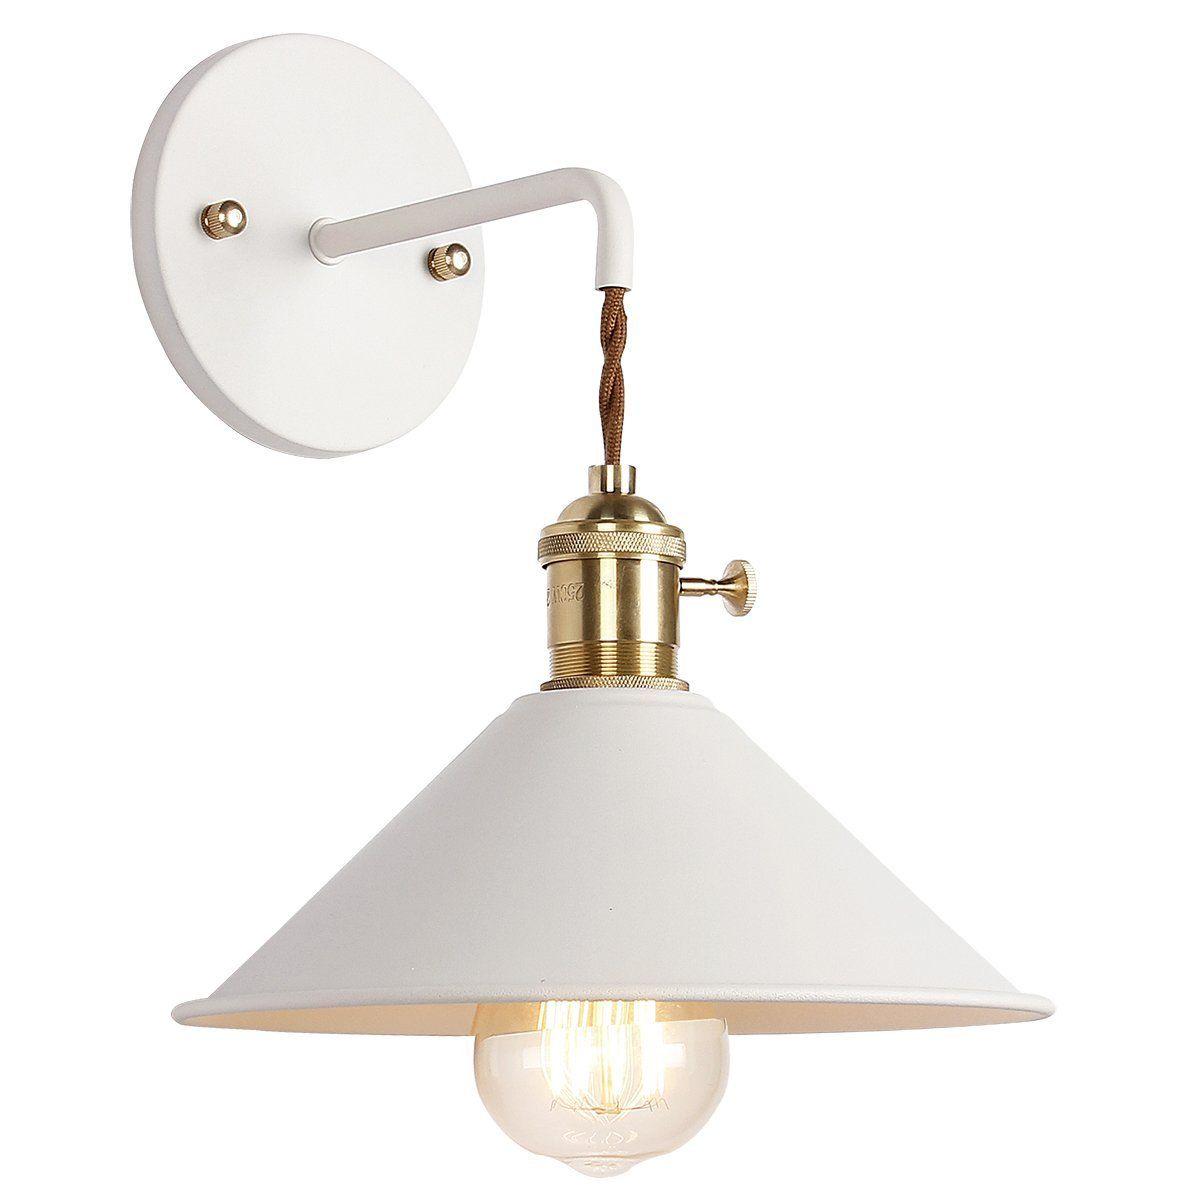 Nordic Wall Sconce Lamps Green Macaron Bedside Reading Light E26 E27 Edison Copper Lamp Holder Aisle Lights Frosted Sconce Lamp Wall Lamp Wall Sconce Lighting